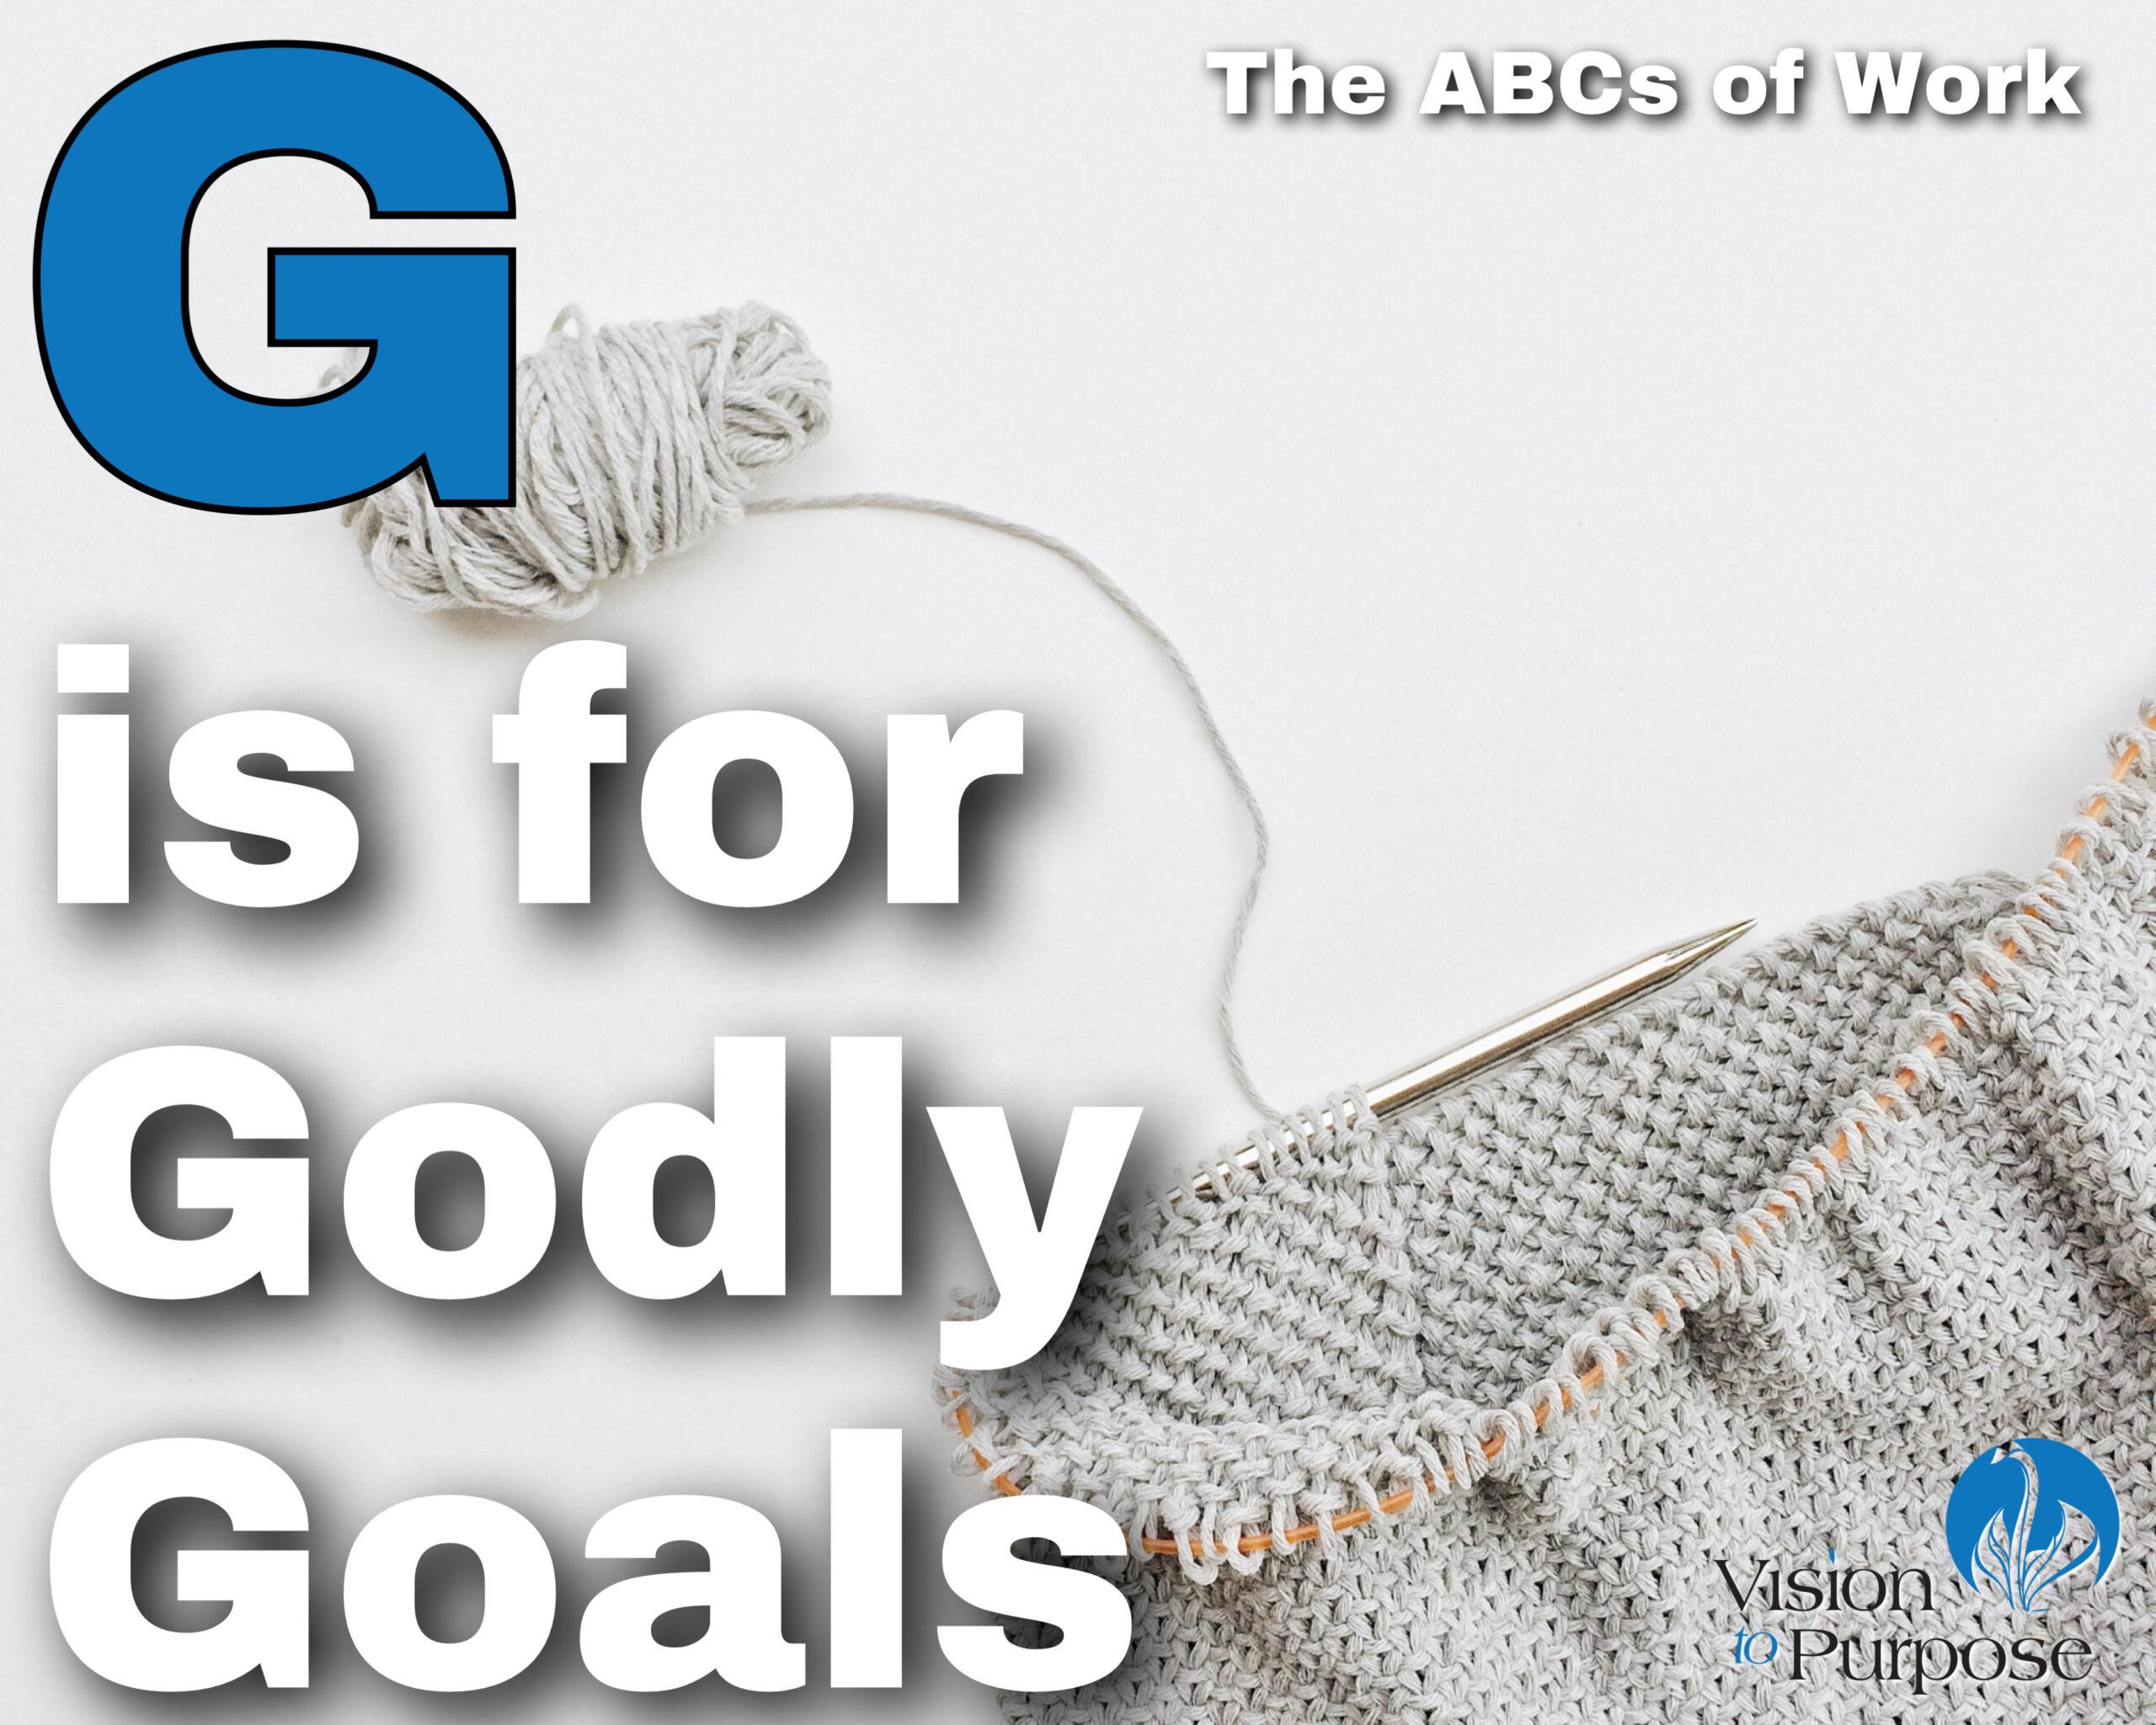 Godly Goals